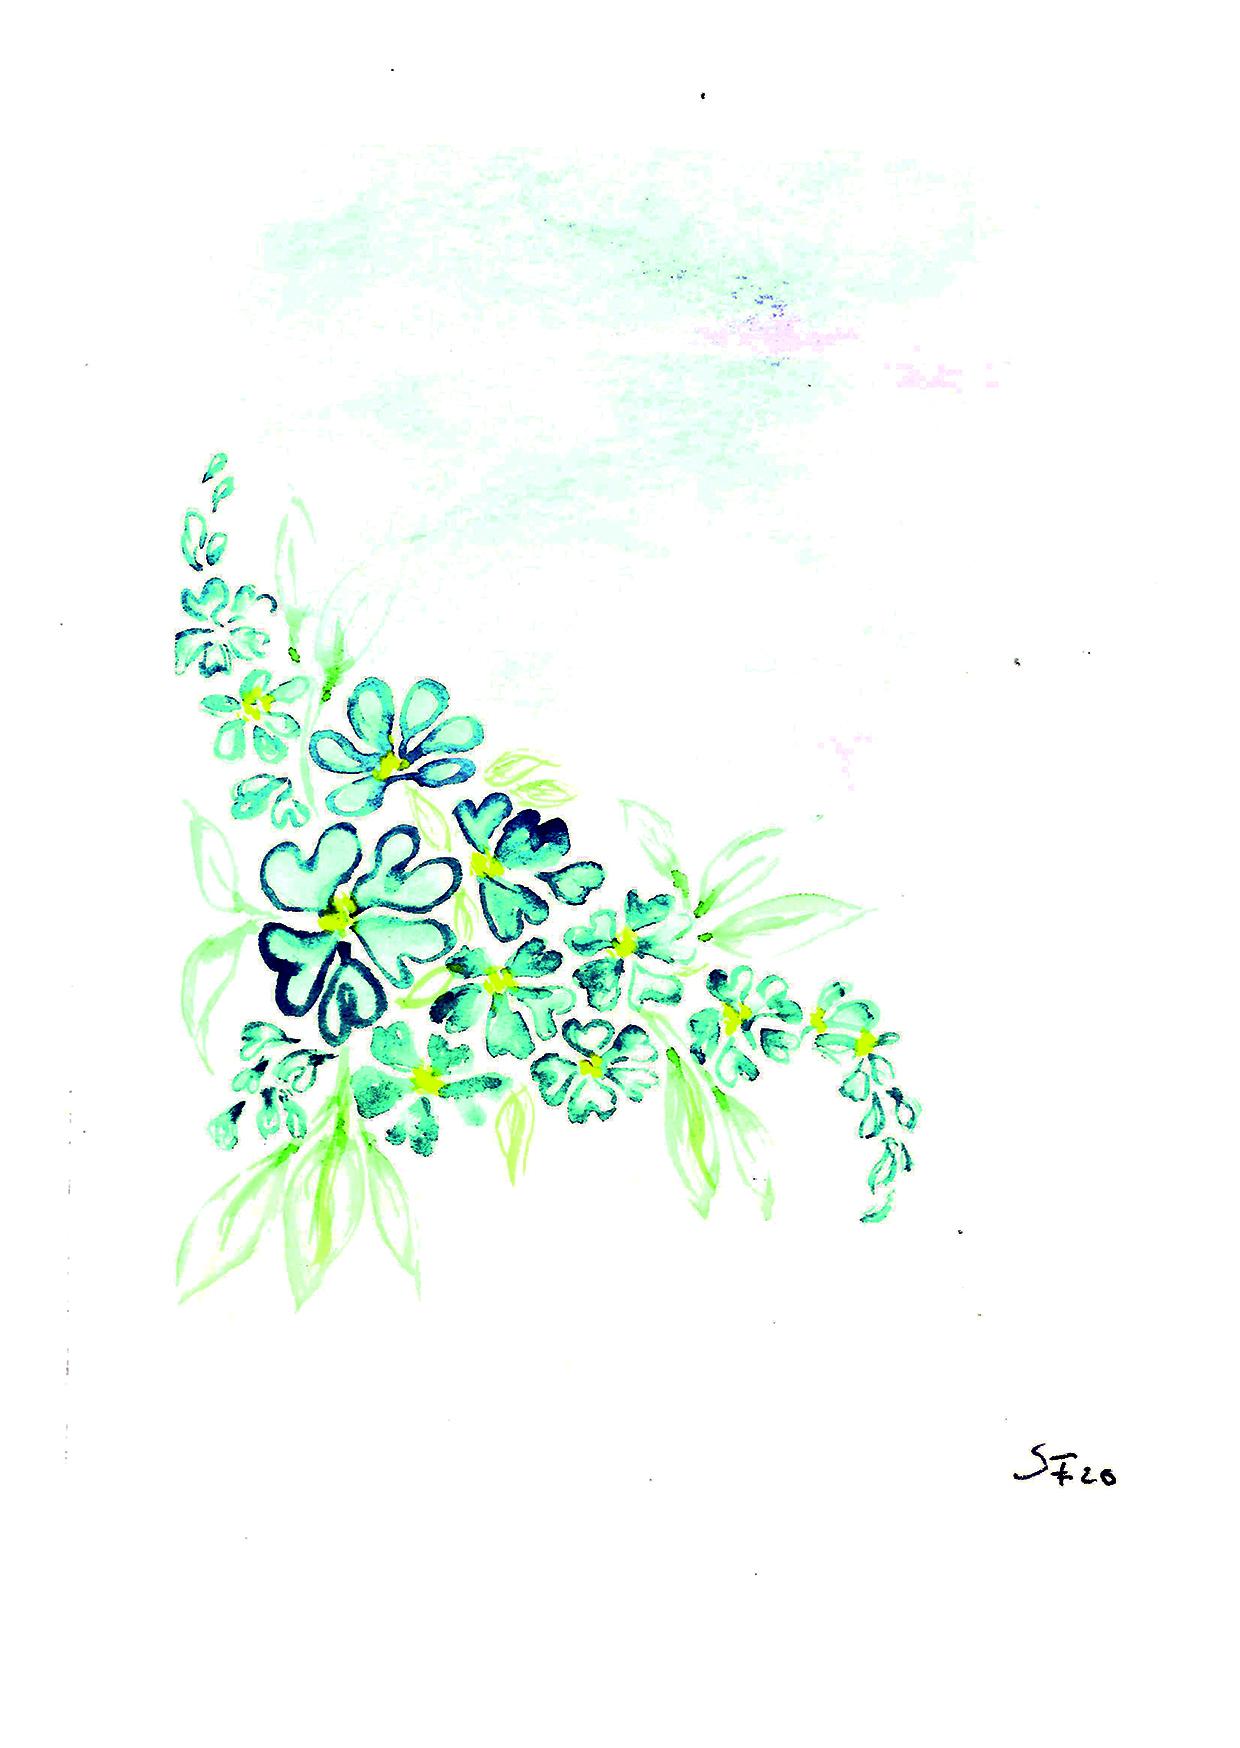 Aquarell blaue Blüten Girlande 04/20